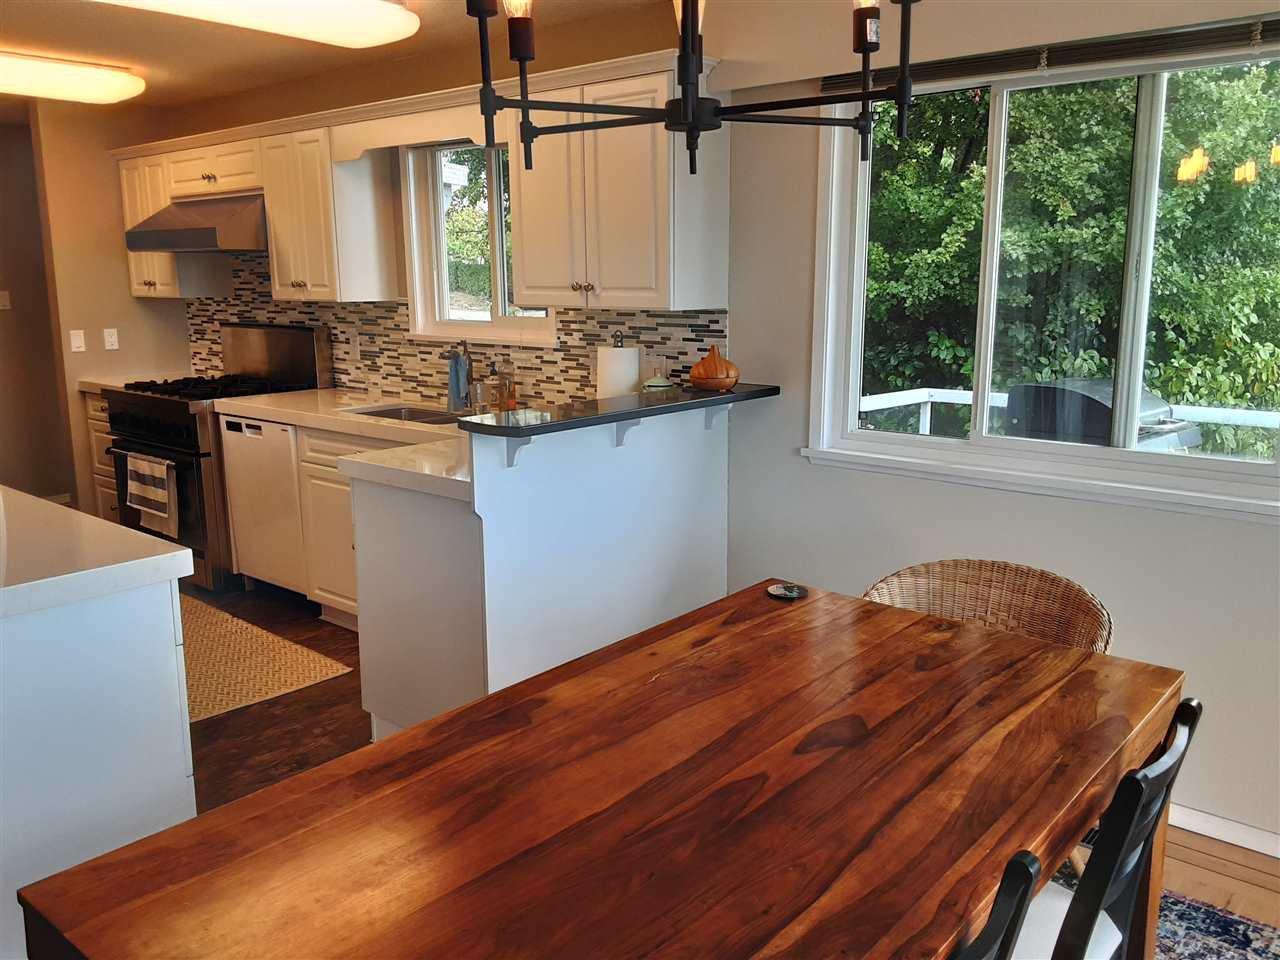 Photo 10: Photos: 15291 COLUMBIA Avenue: White Rock House for sale (South Surrey White Rock)  : MLS®# R2492863